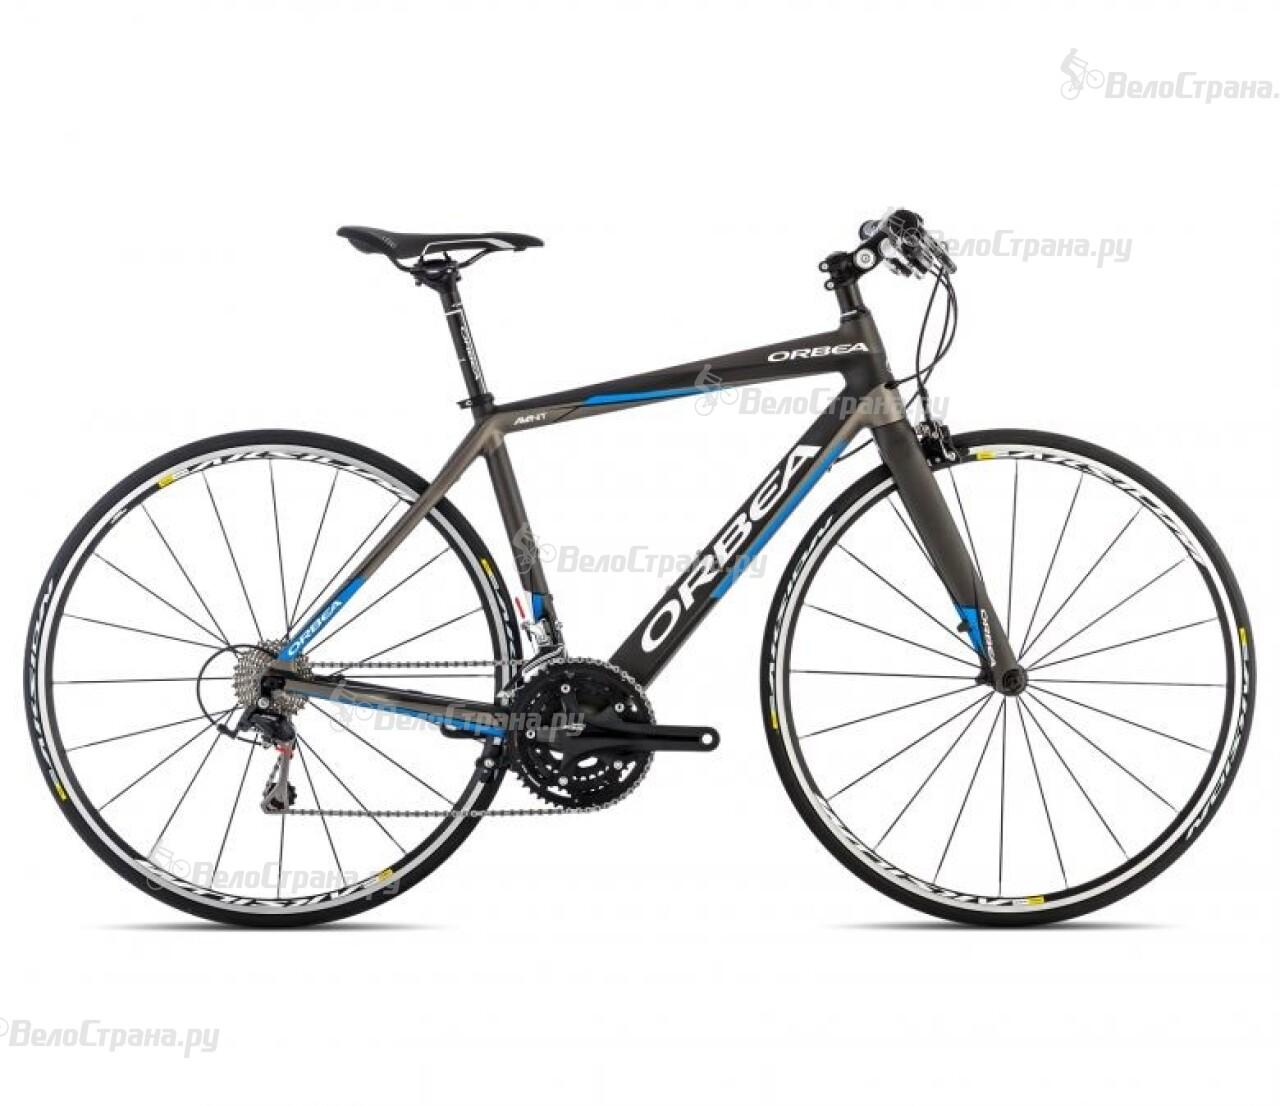 Велосипед Orbea Avant M50 Flat (2014) аккумулятор для ноутбука oem 5200mah asus n61 n61j n61d n61v n61vg n61ja n61jv n53 a32 m50 m50s n53s n53sv a32 m50 a32 n61 a32 x 64 33 m50 n53s n53 a32 m50 m50s n53s n53sv a32 m50